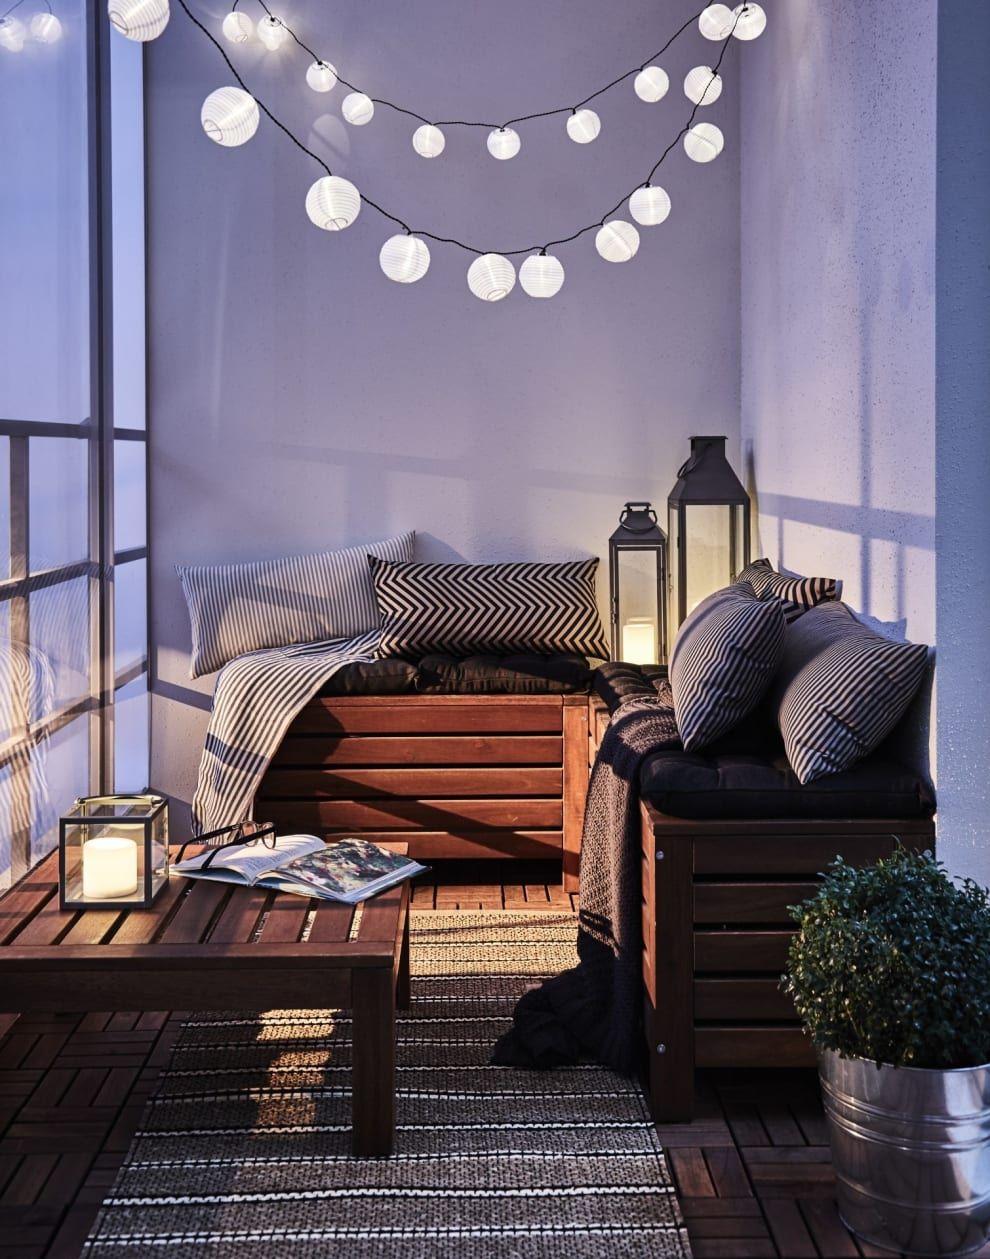 Tavolino Per Balcone Ikea 12 ikea® products that will transform your backyard into a